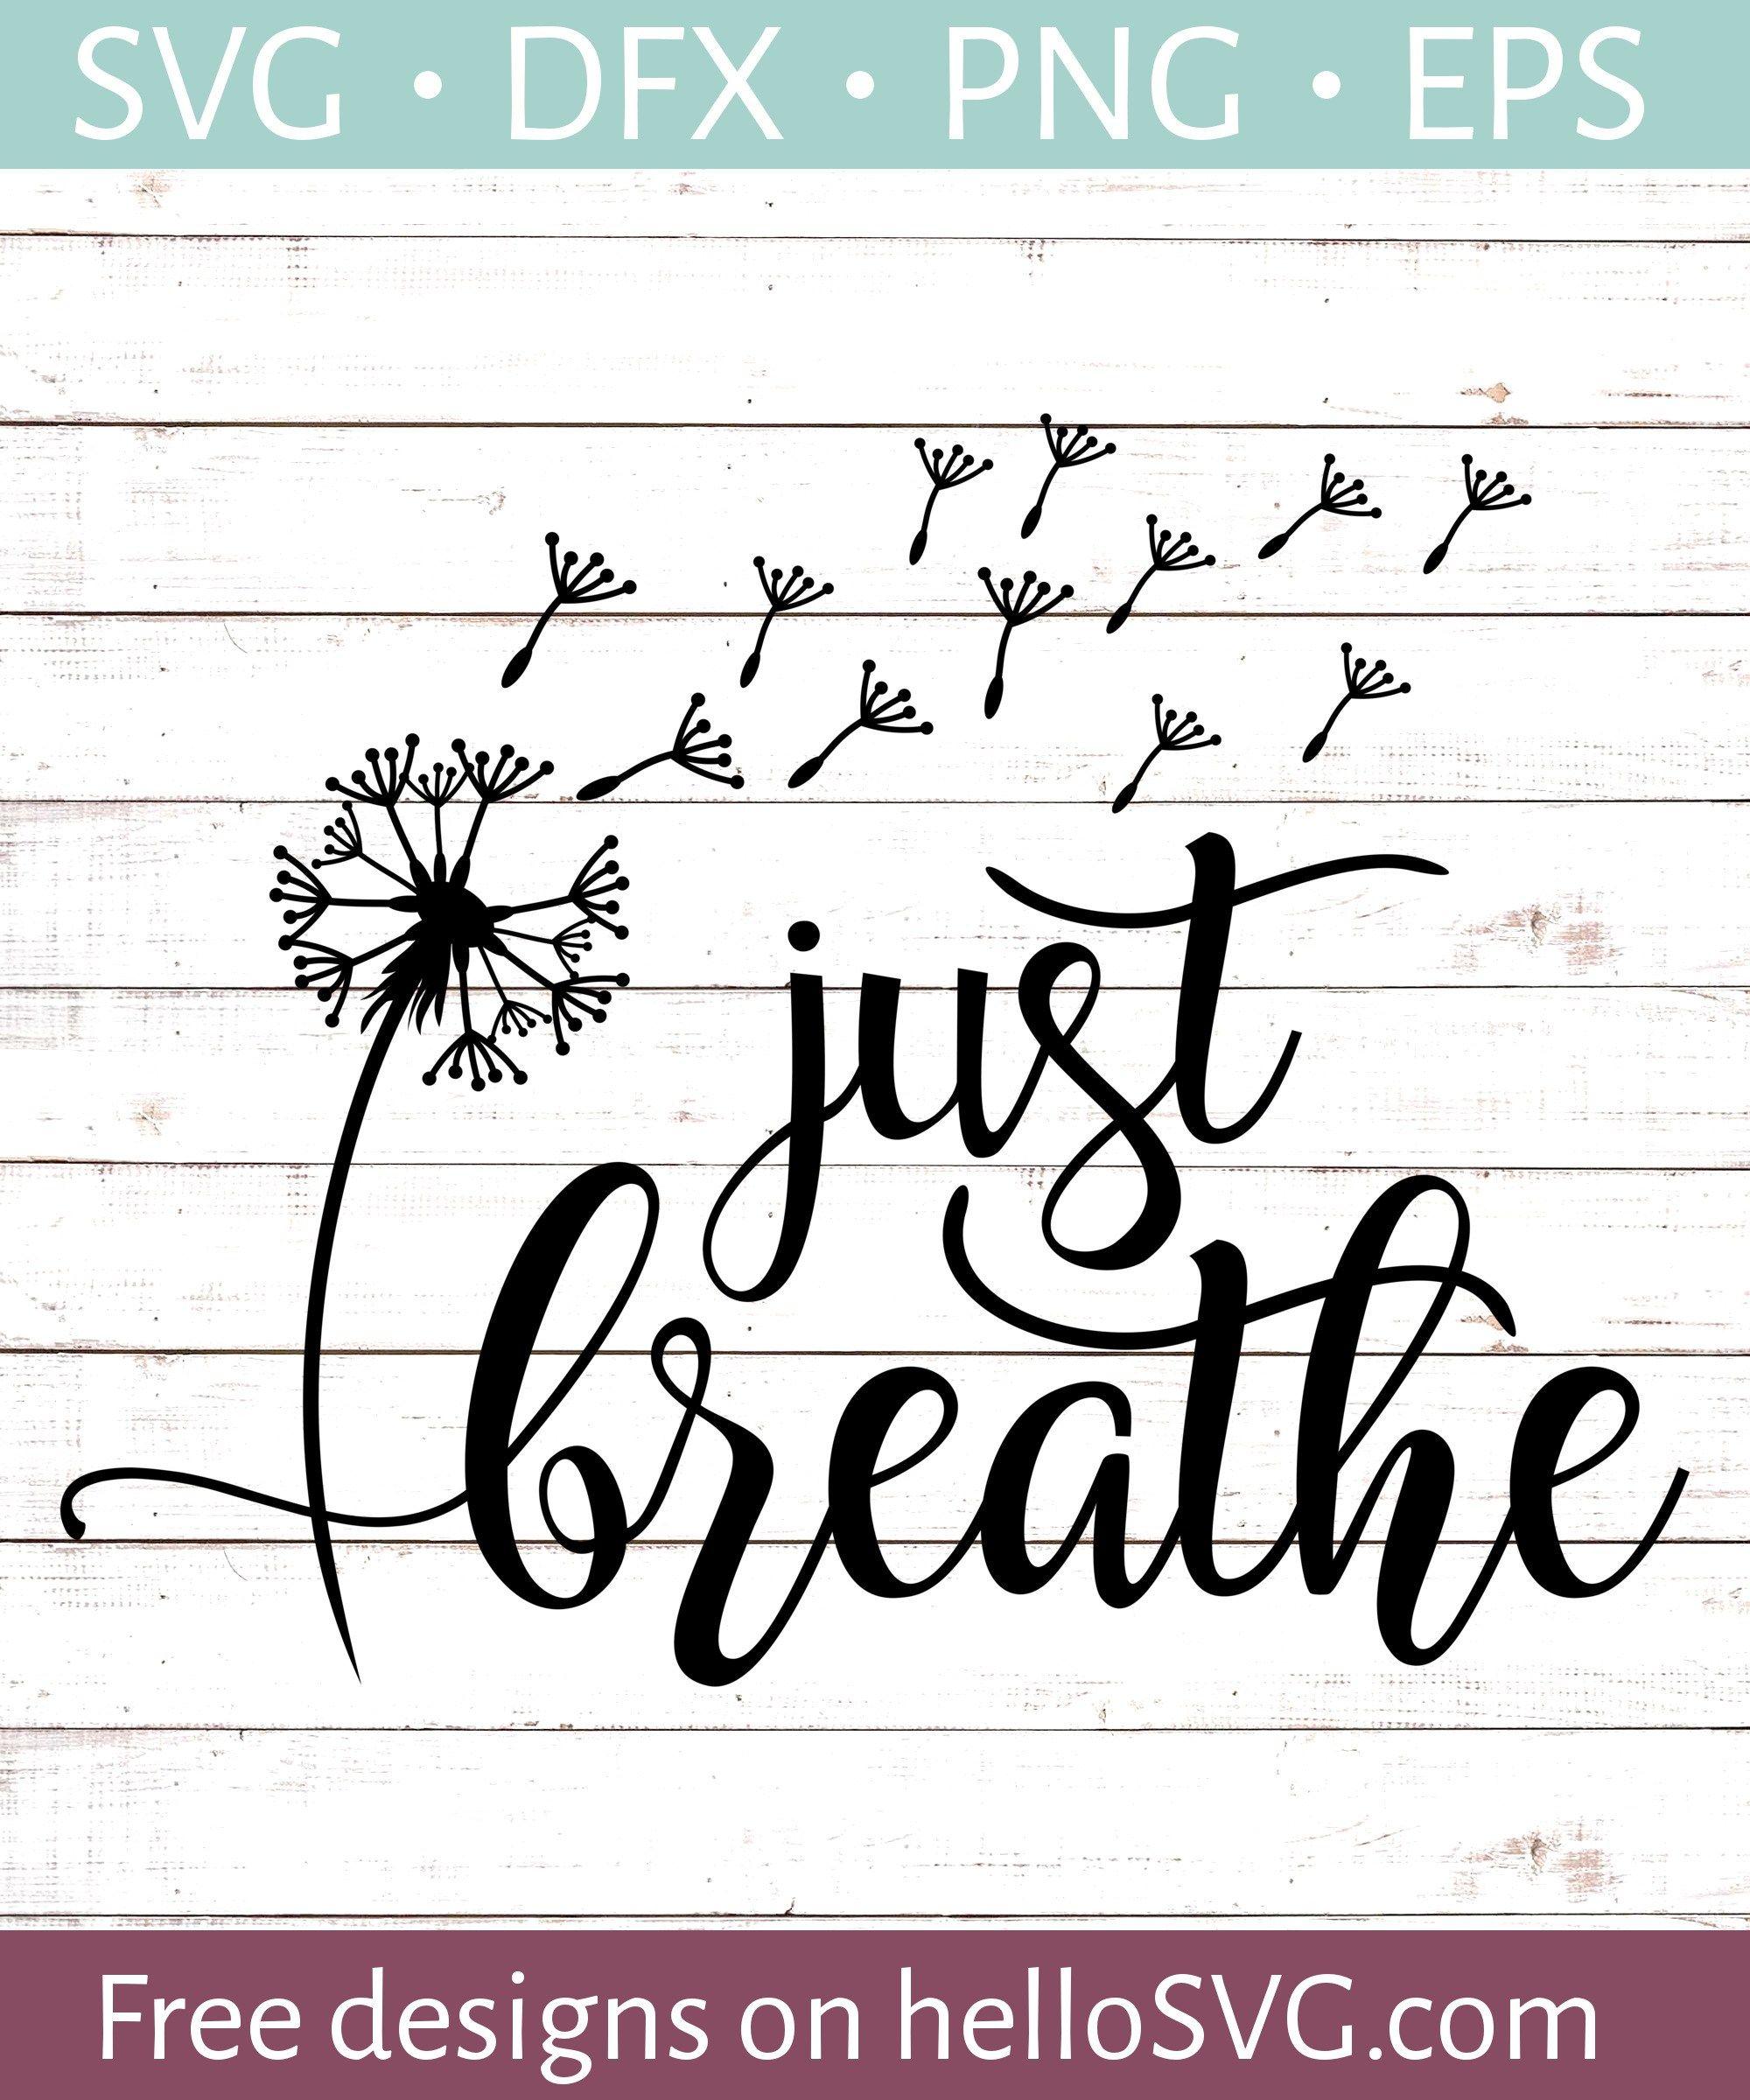 Just Breathe (with Dandelion) SVG Free SVG files